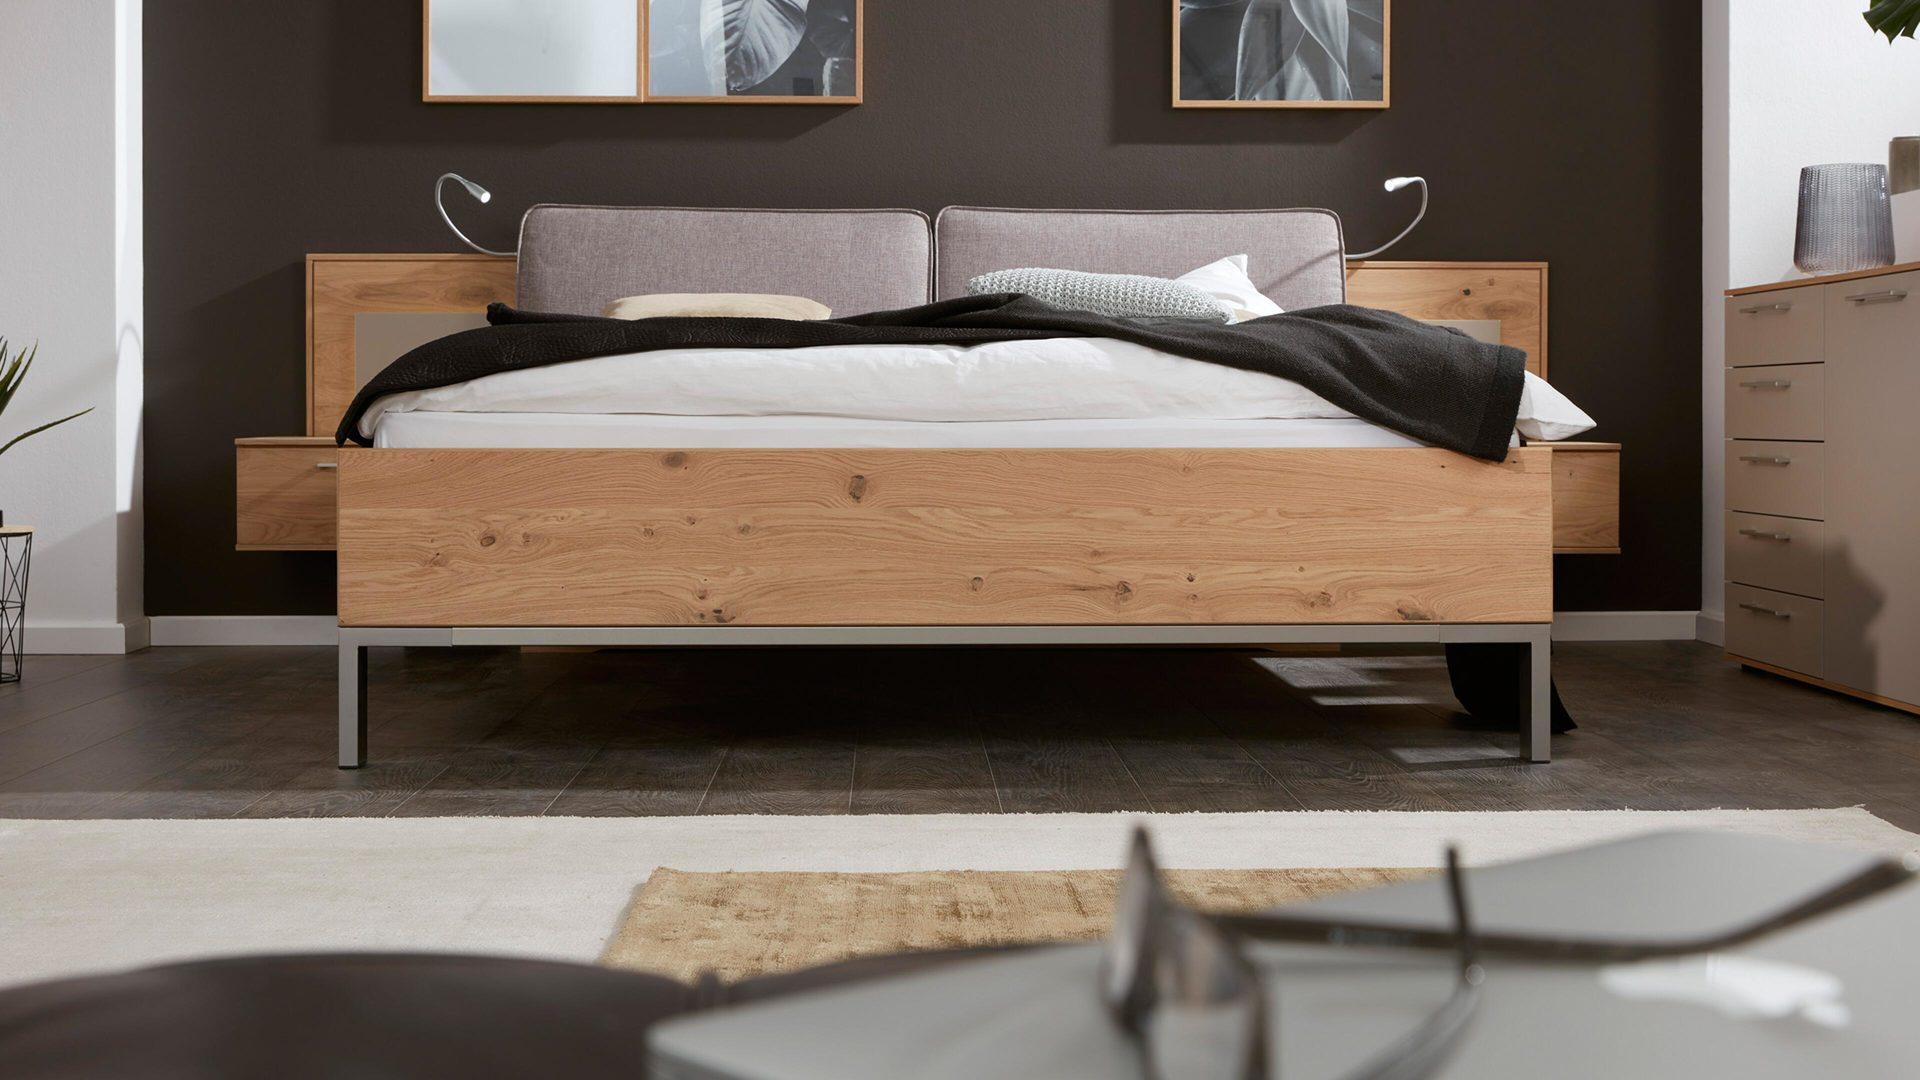 Interliving Schlafzimmer Serie 1008 Bettgestell Taupefarbene